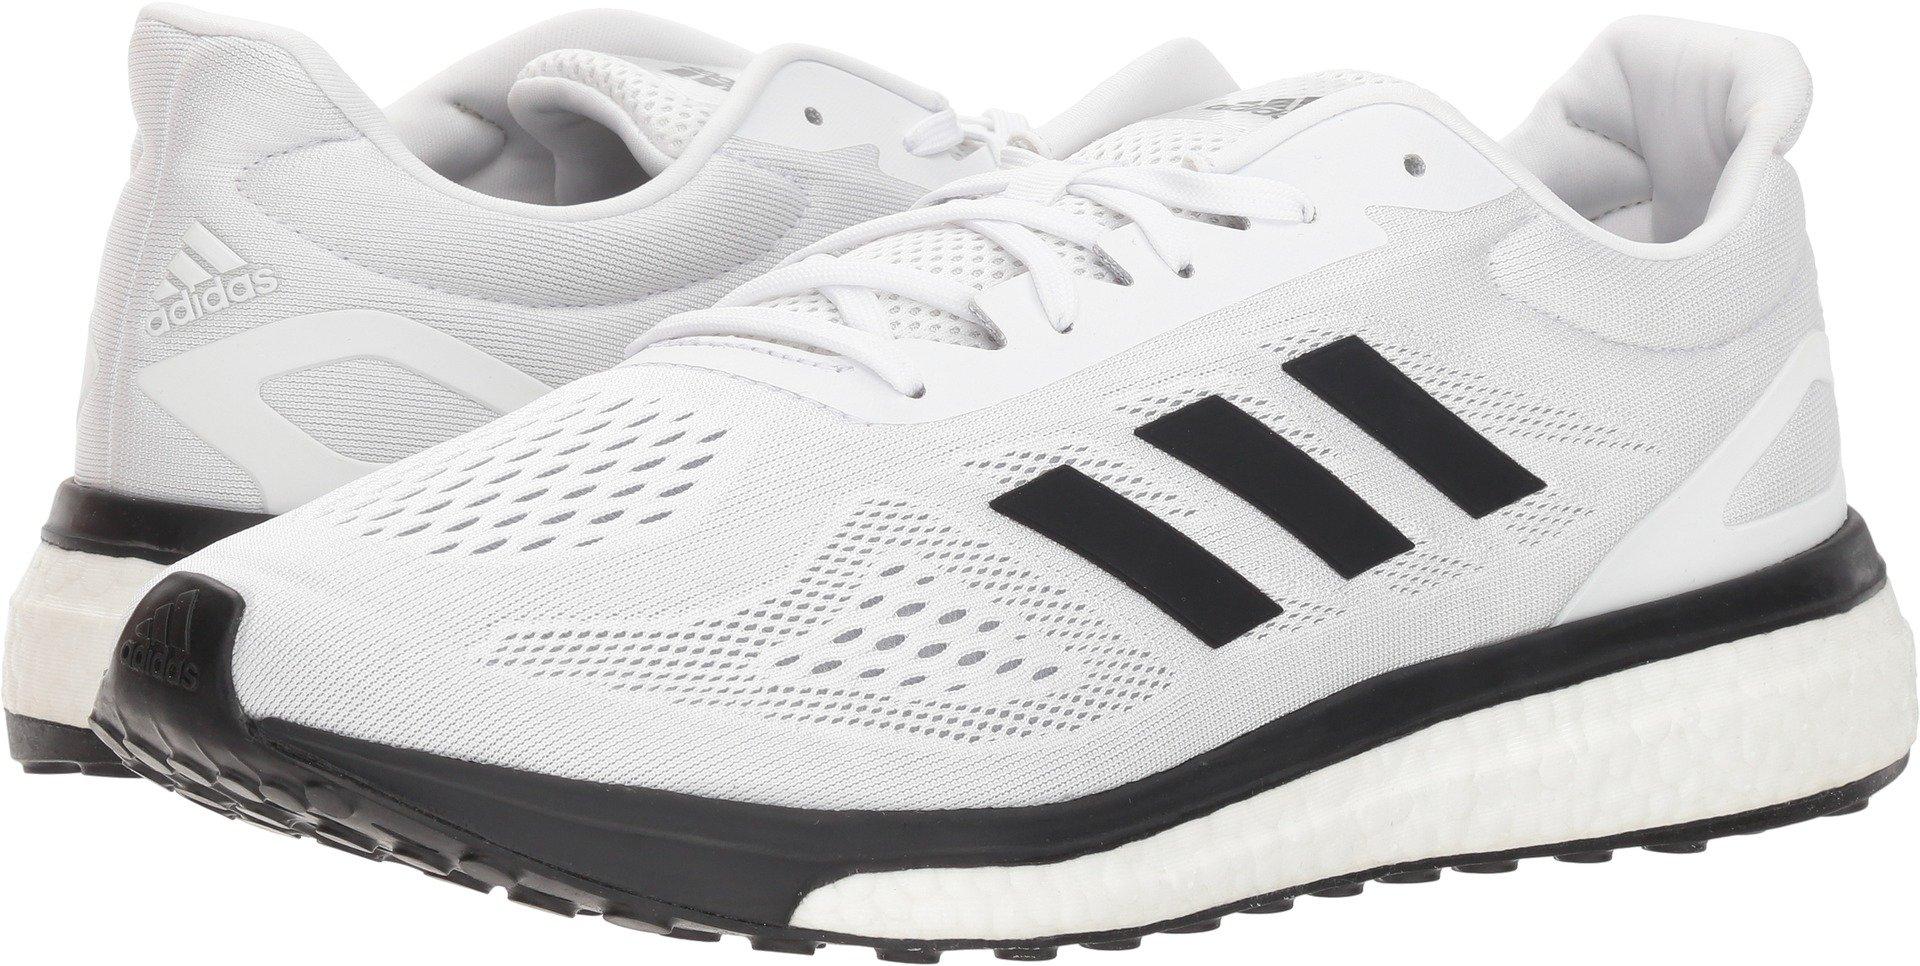 b8153a4c37ce51 Galleon - Adidas Response Boost LT Mens Running Shoe 9.5 White-Black ...